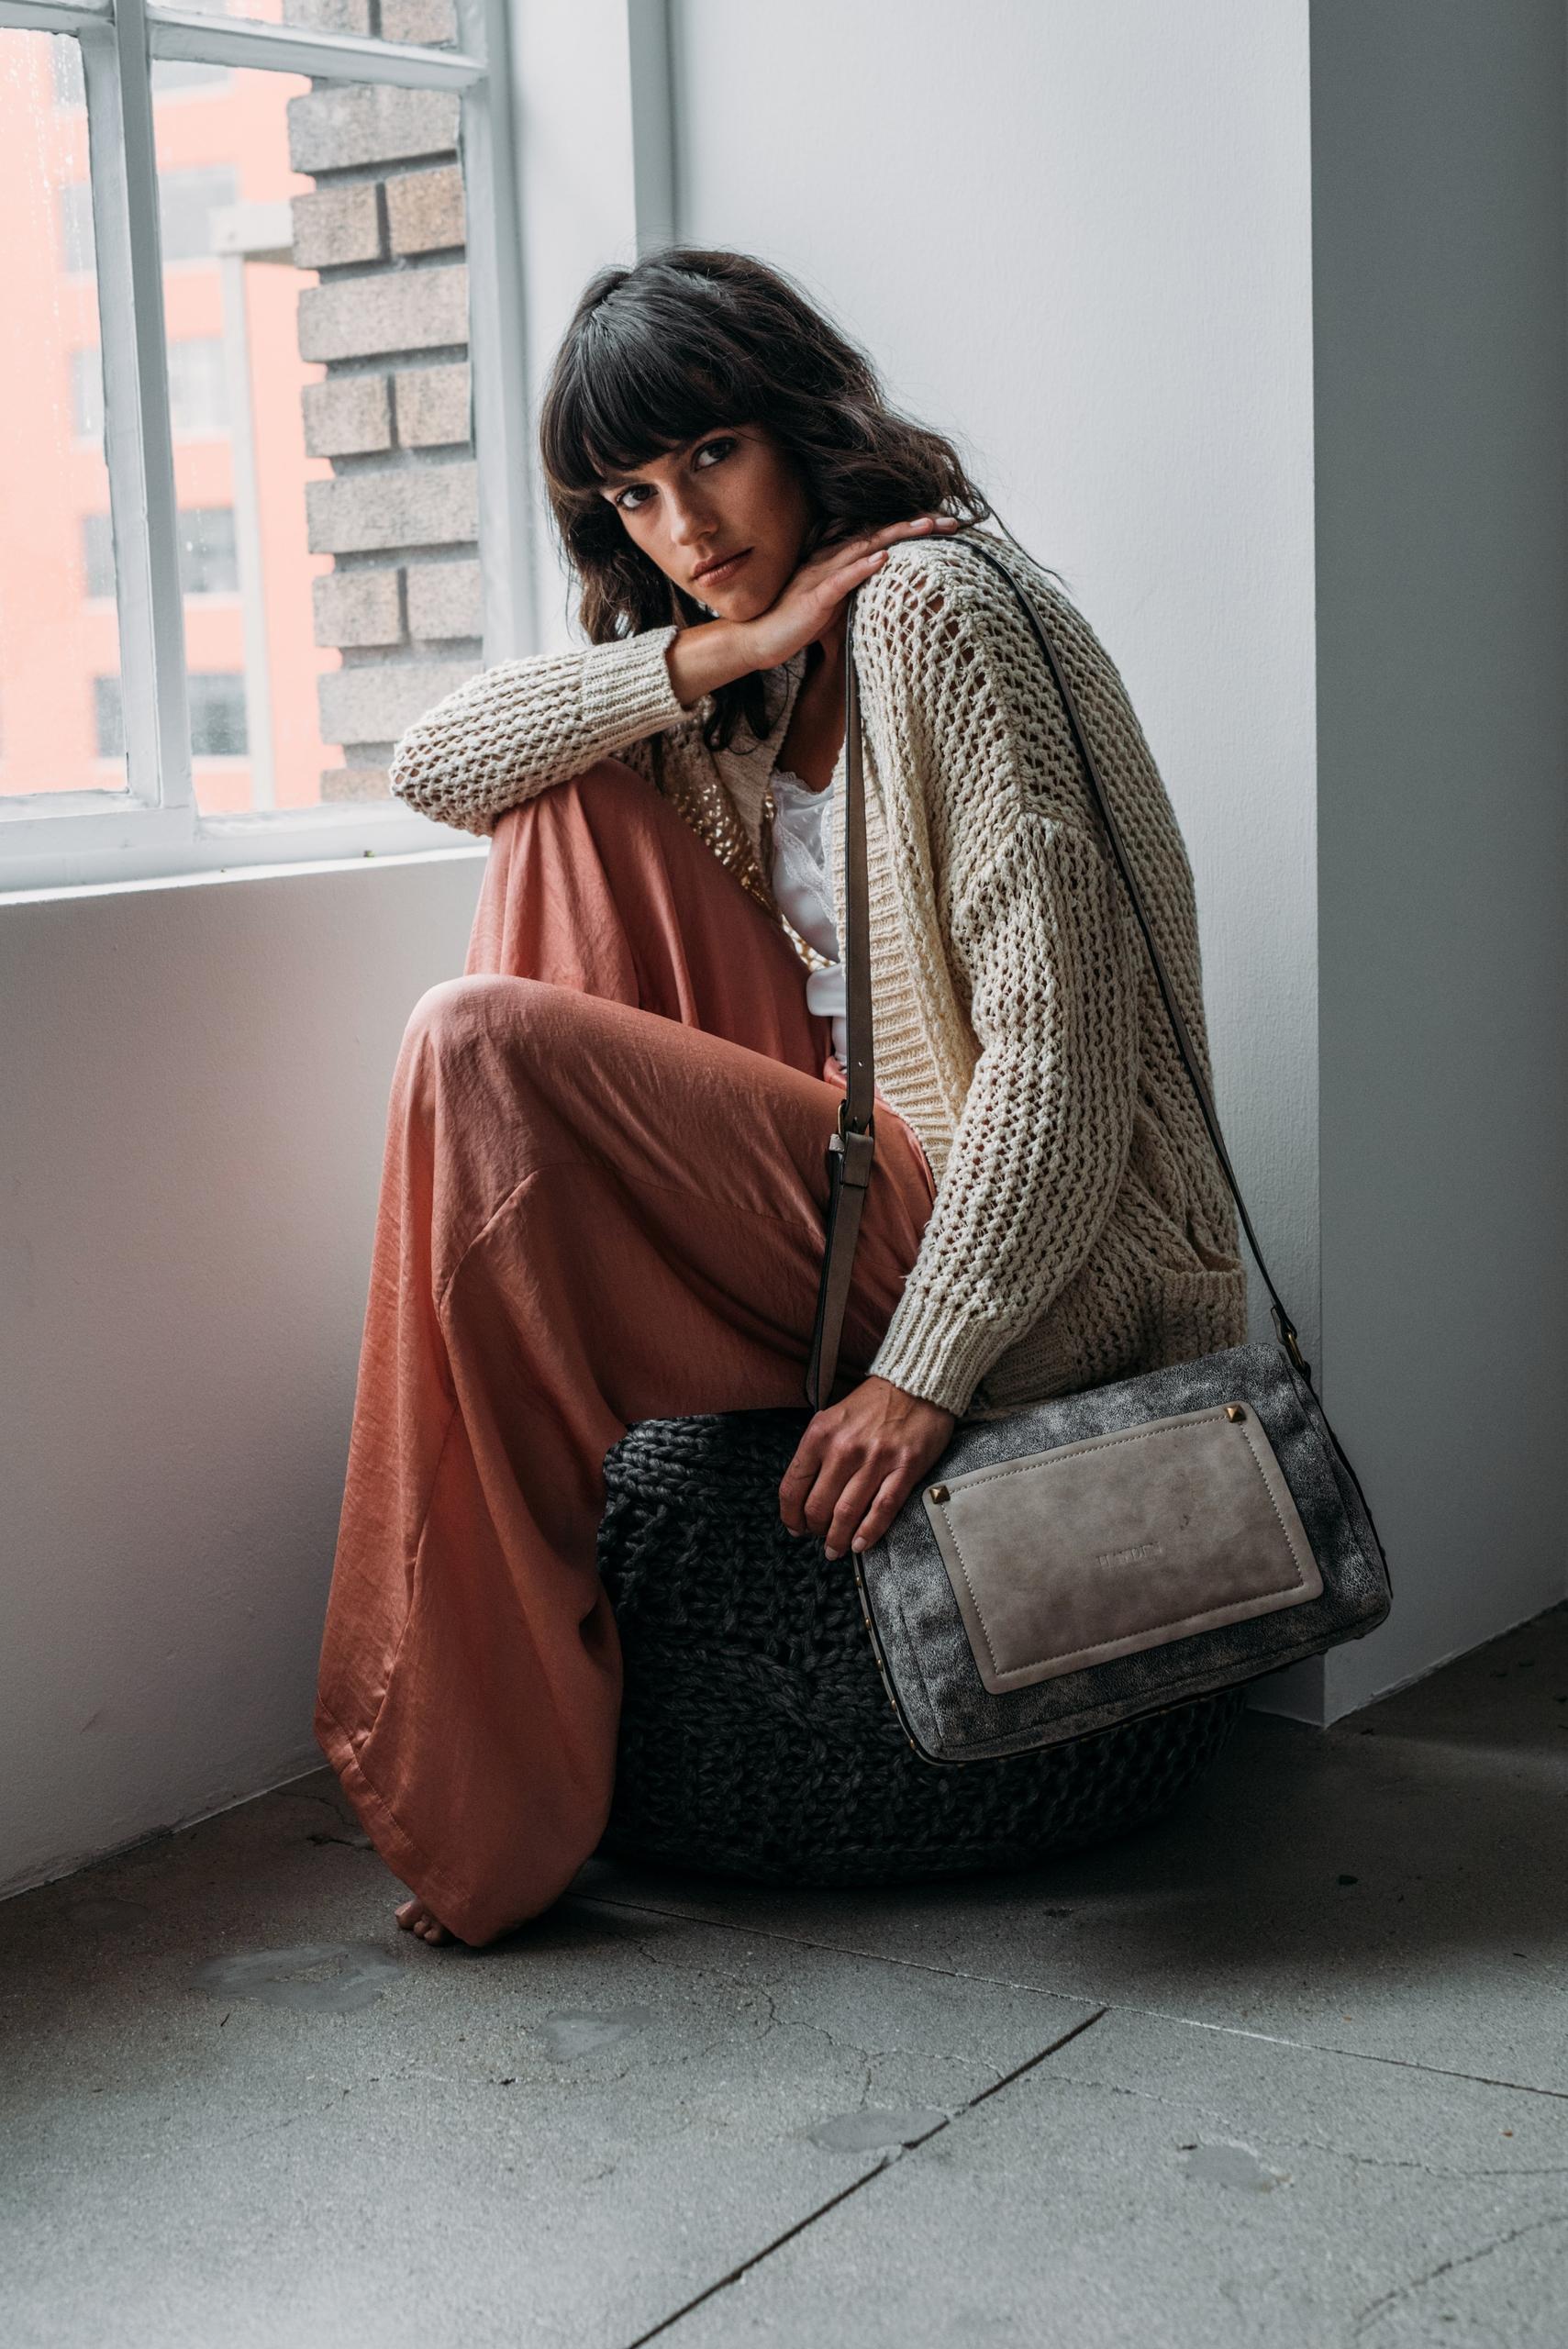 Fashion haydenharnett.com - fashion - ben-staley | ello